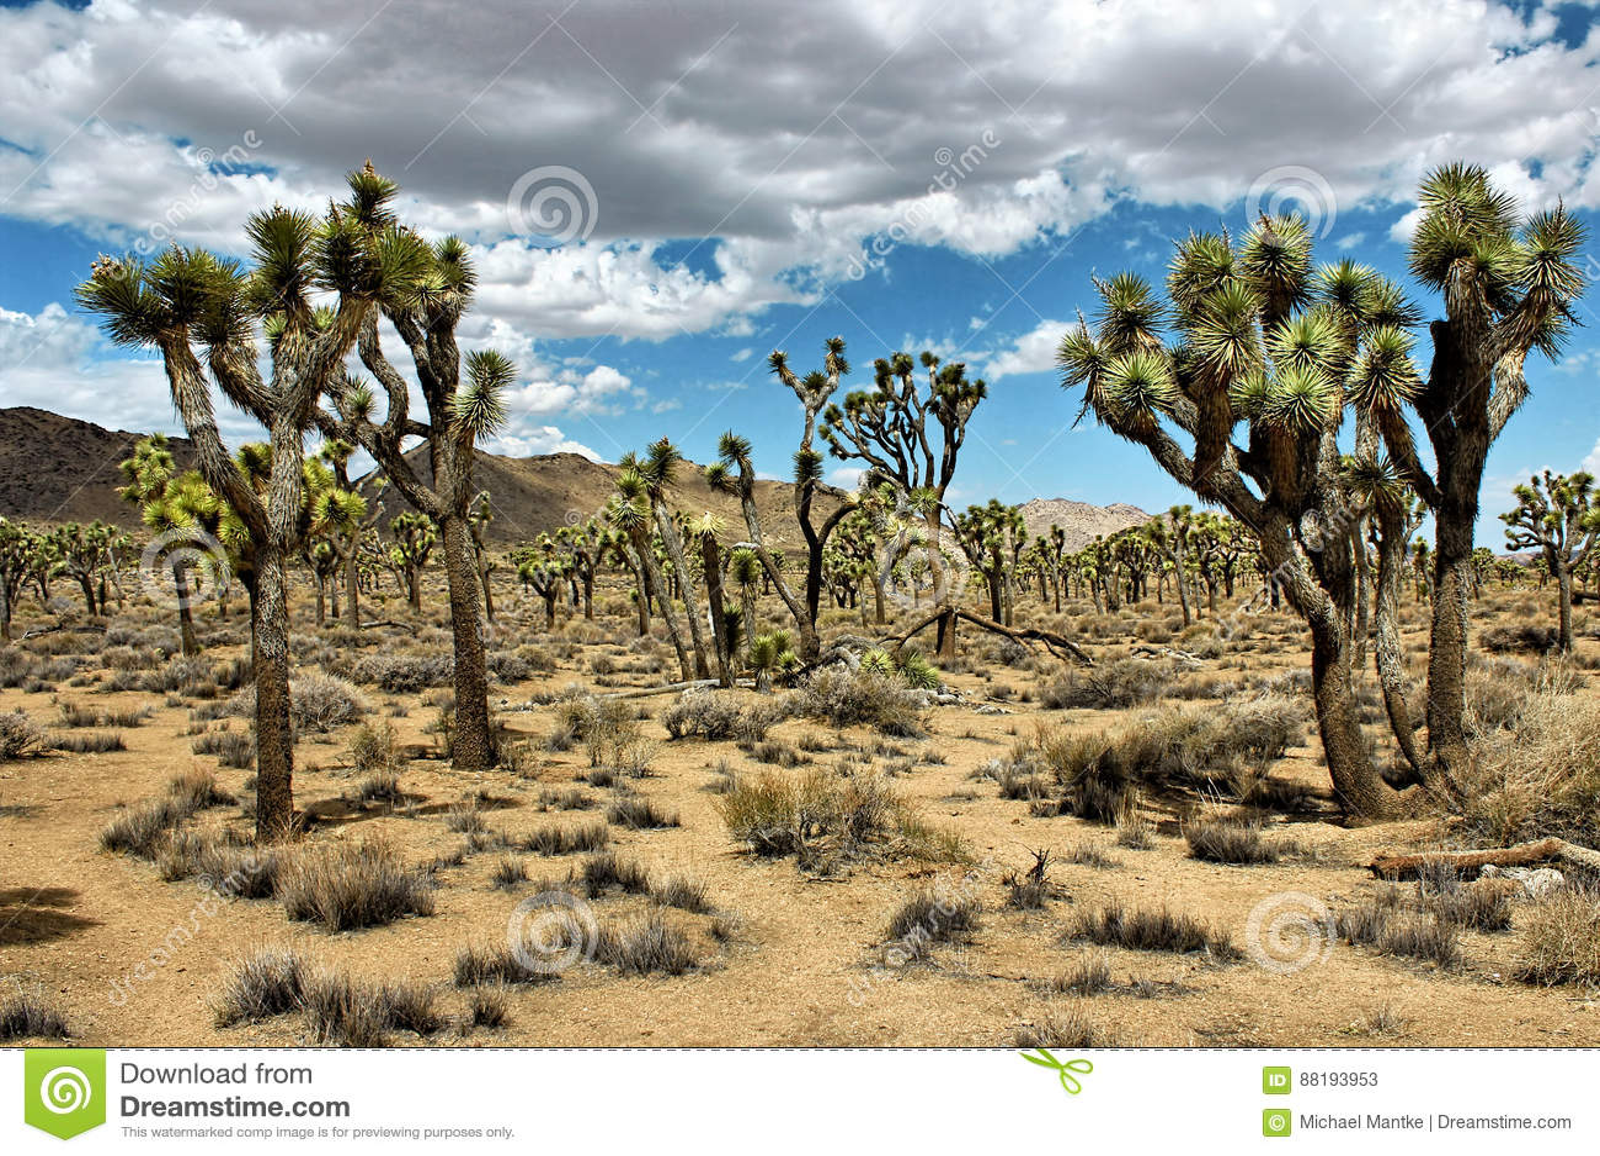 Joshua Tree National Park Mojave Desert California Usa Stock